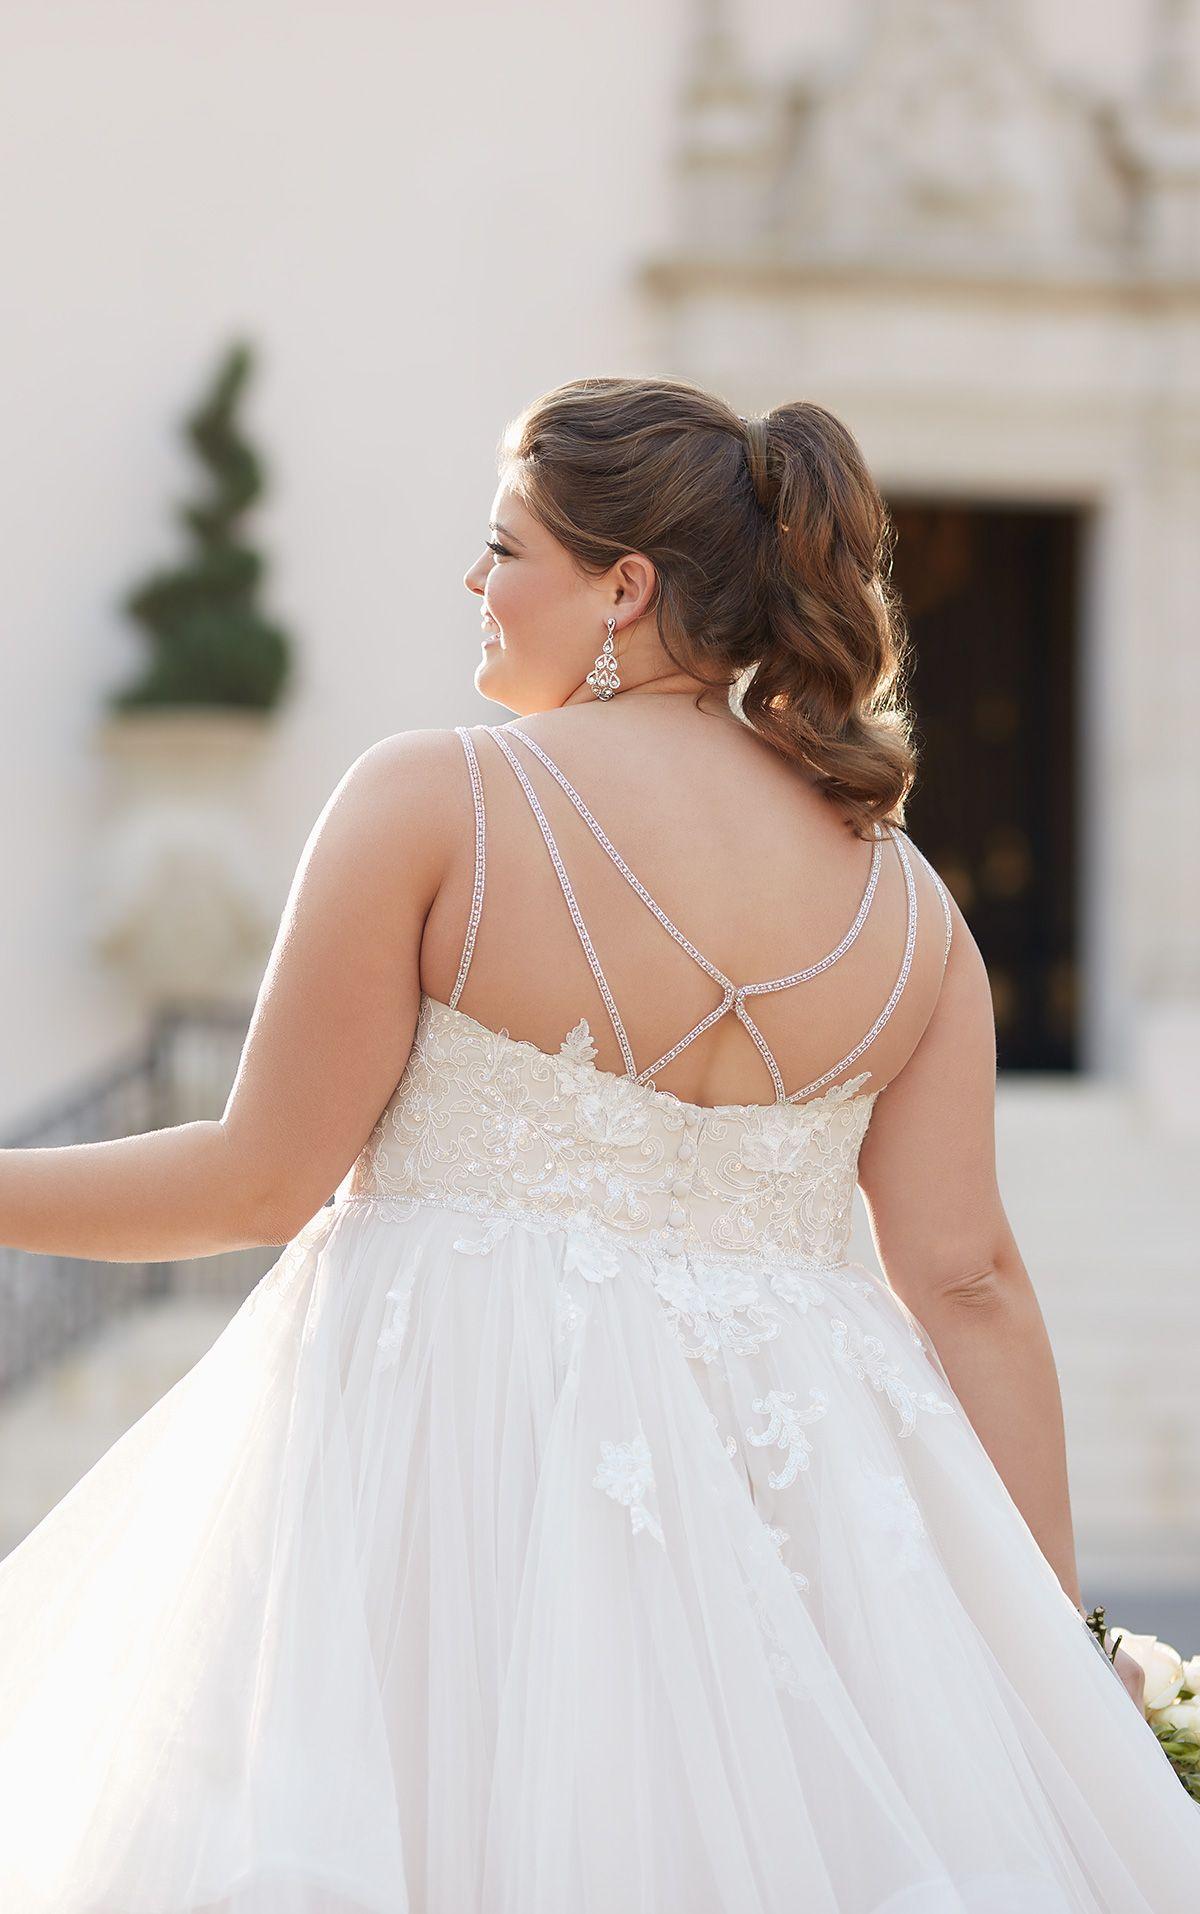 Shimmering Ballgown Plus Size Wedding Dress Stella York Wedding Dresses Plus Size Wedding Gowns Ball Gown Wedding Dress Alternative Wedding Dresses [ 1914 x 1200 Pixel ]